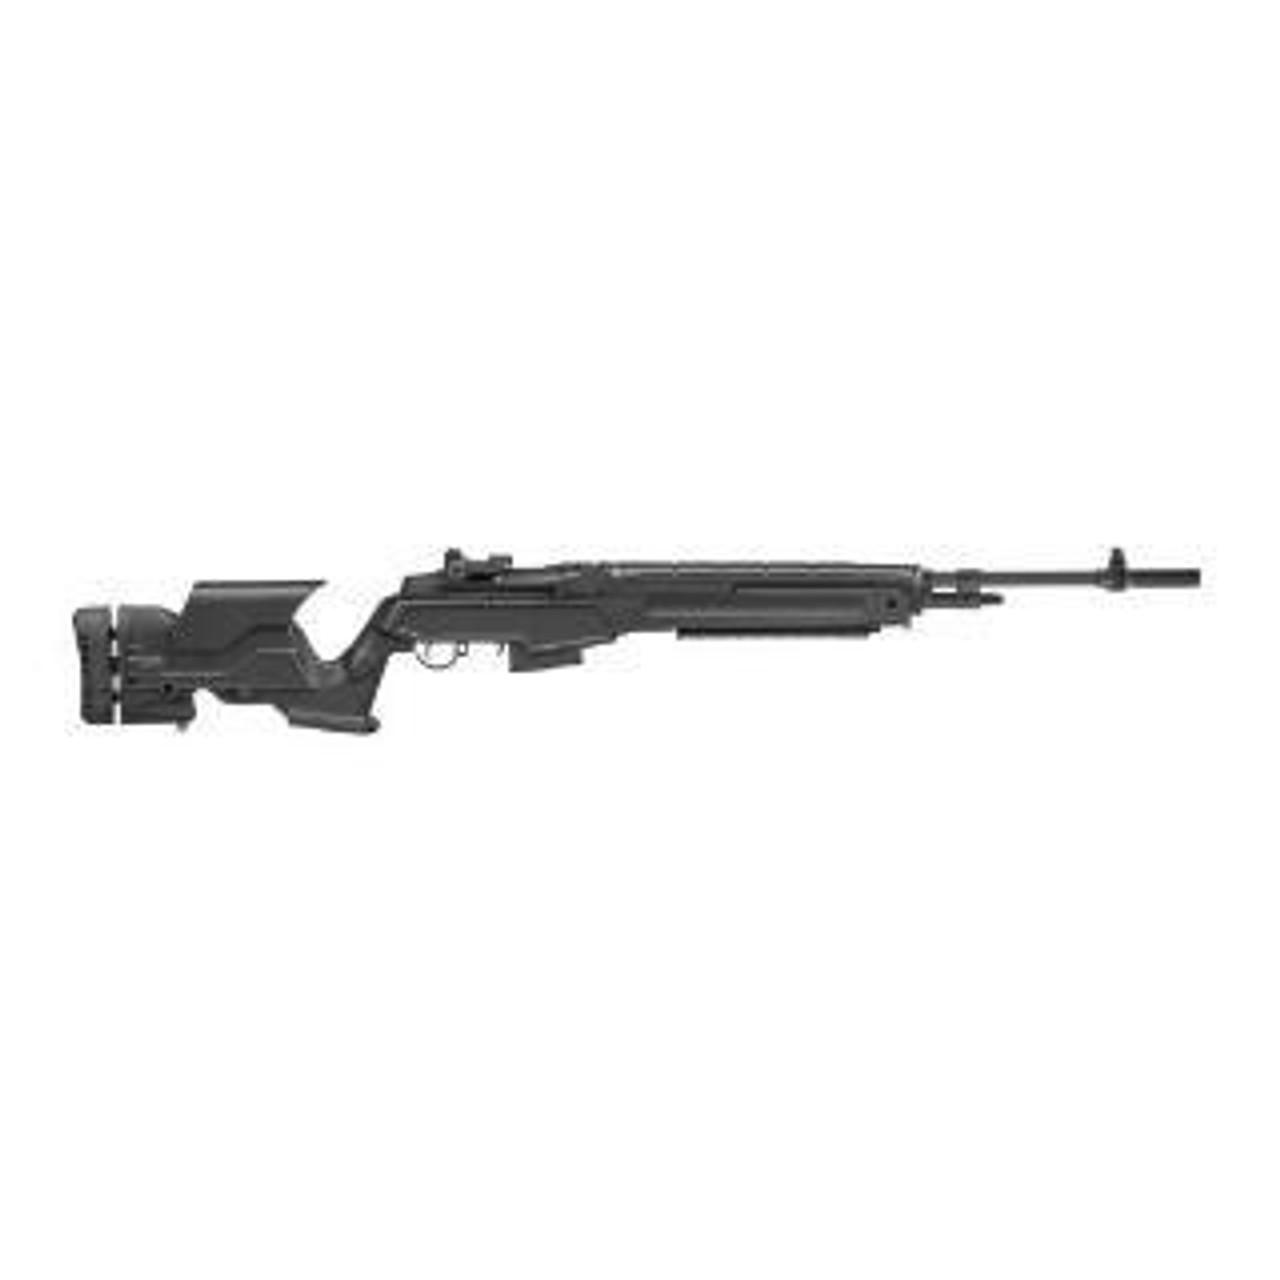 Springfield M1A Precision CALIFORNIA LEGAL - .308/7.62x51